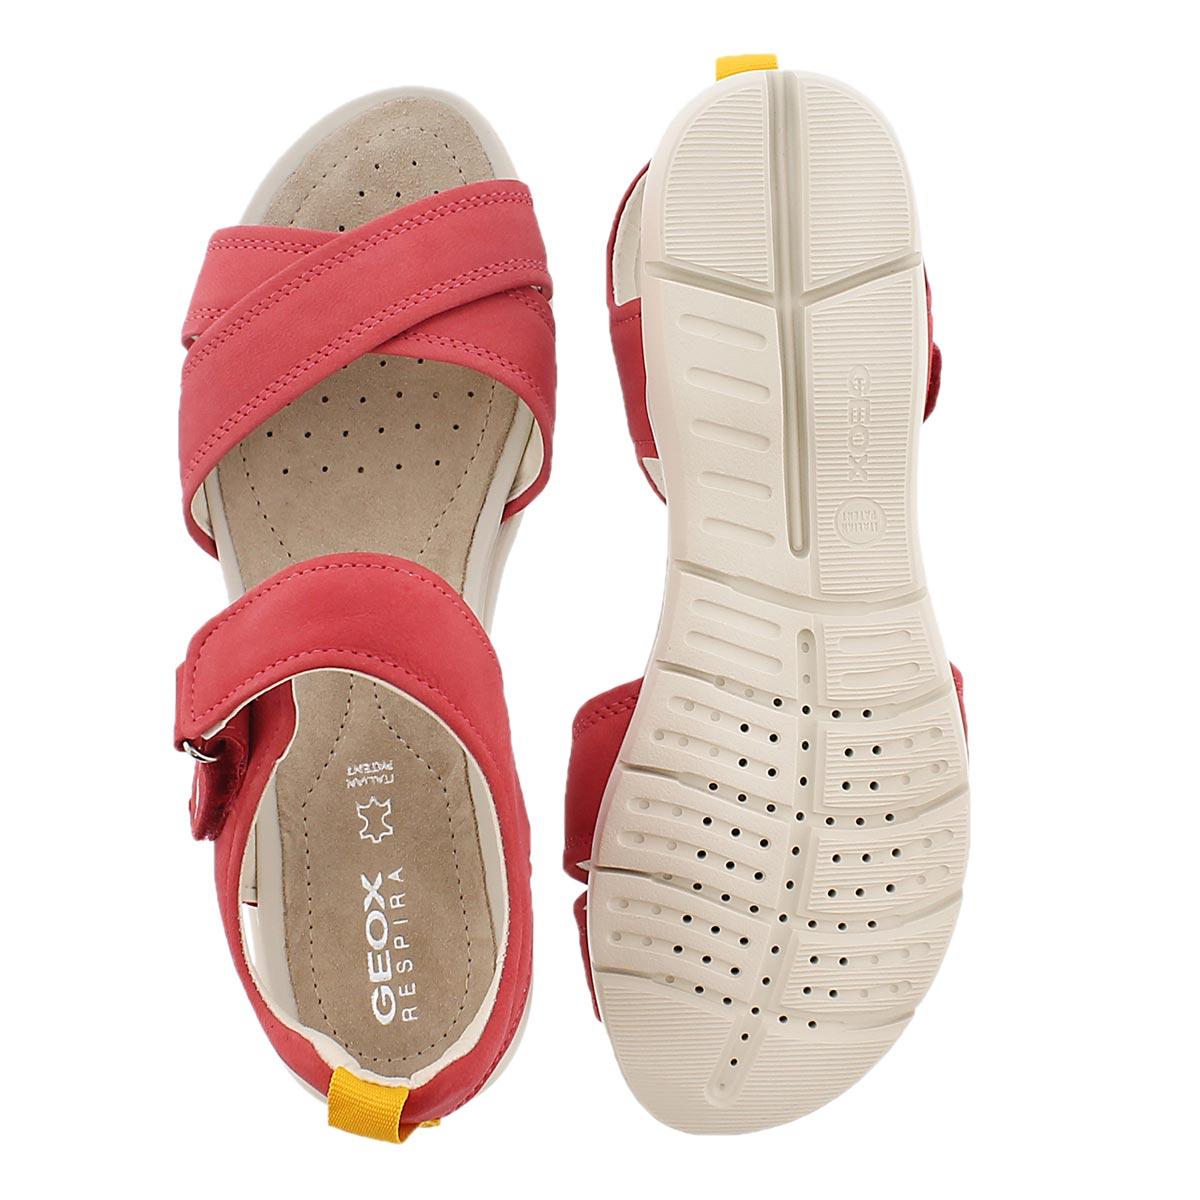 Lds Sukie coral casual sandal